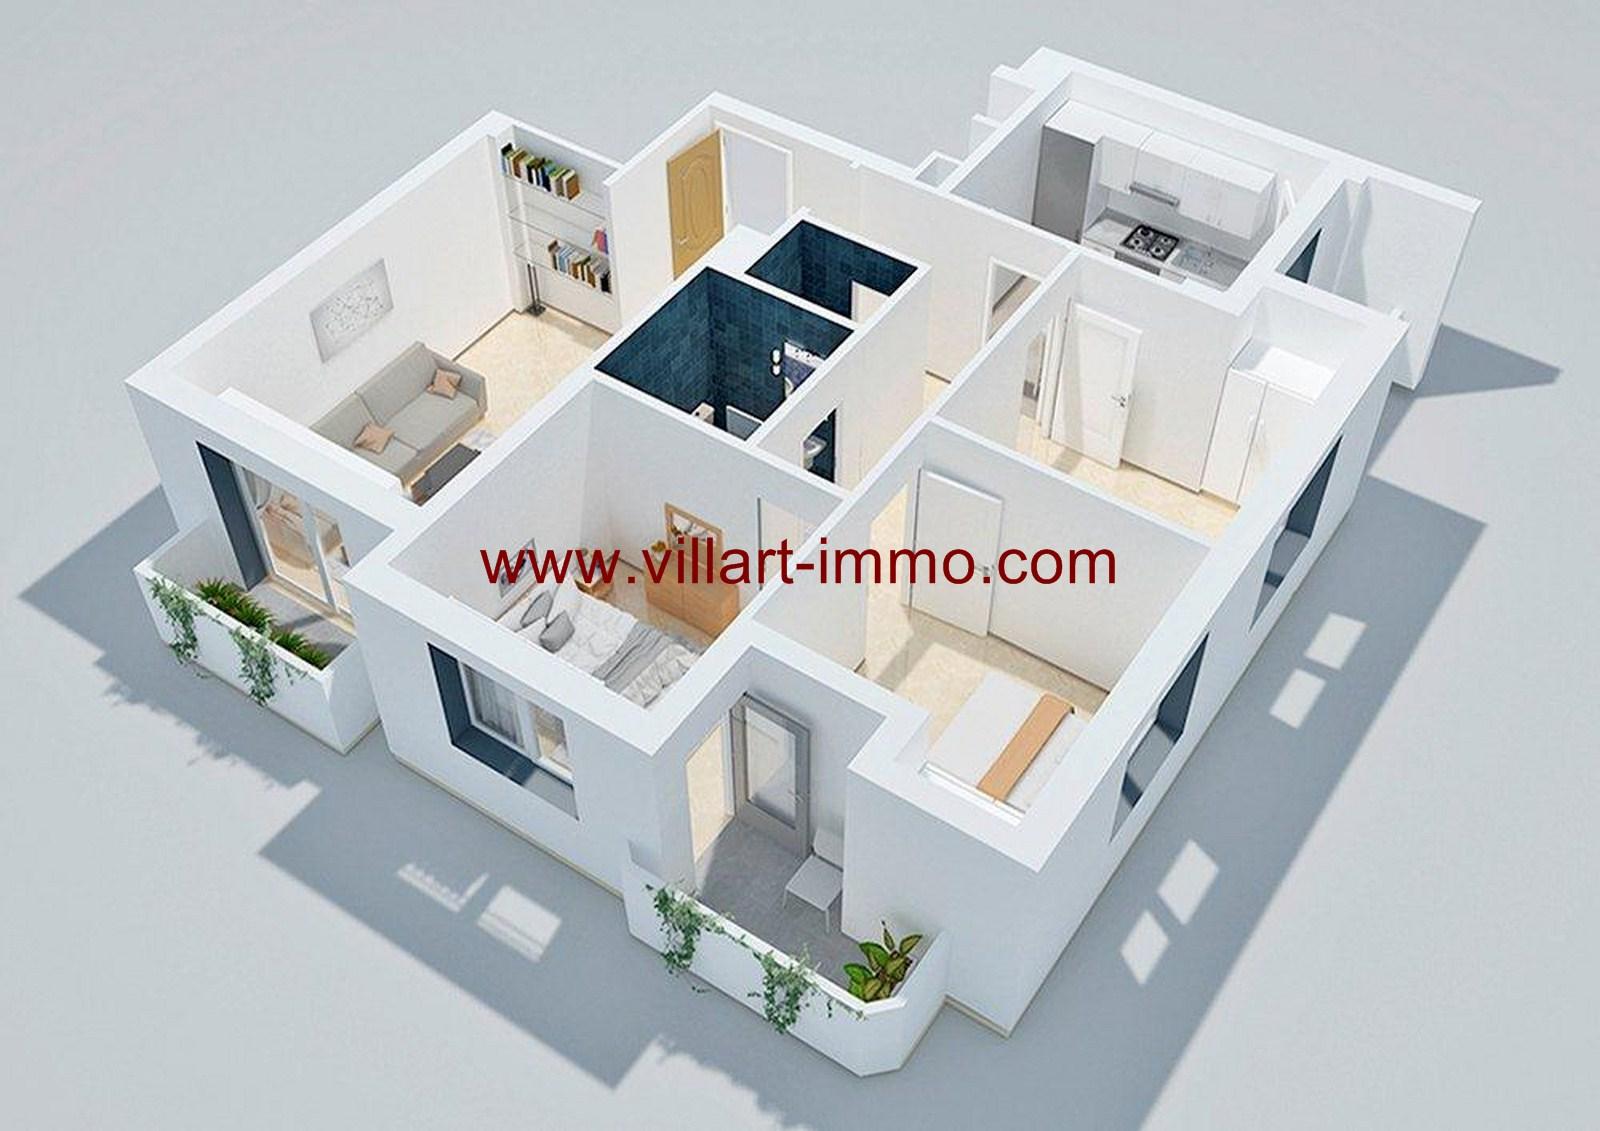 5-Vente-Appartement-Tanger-Centre-ville-SHAZ-Villart Immo